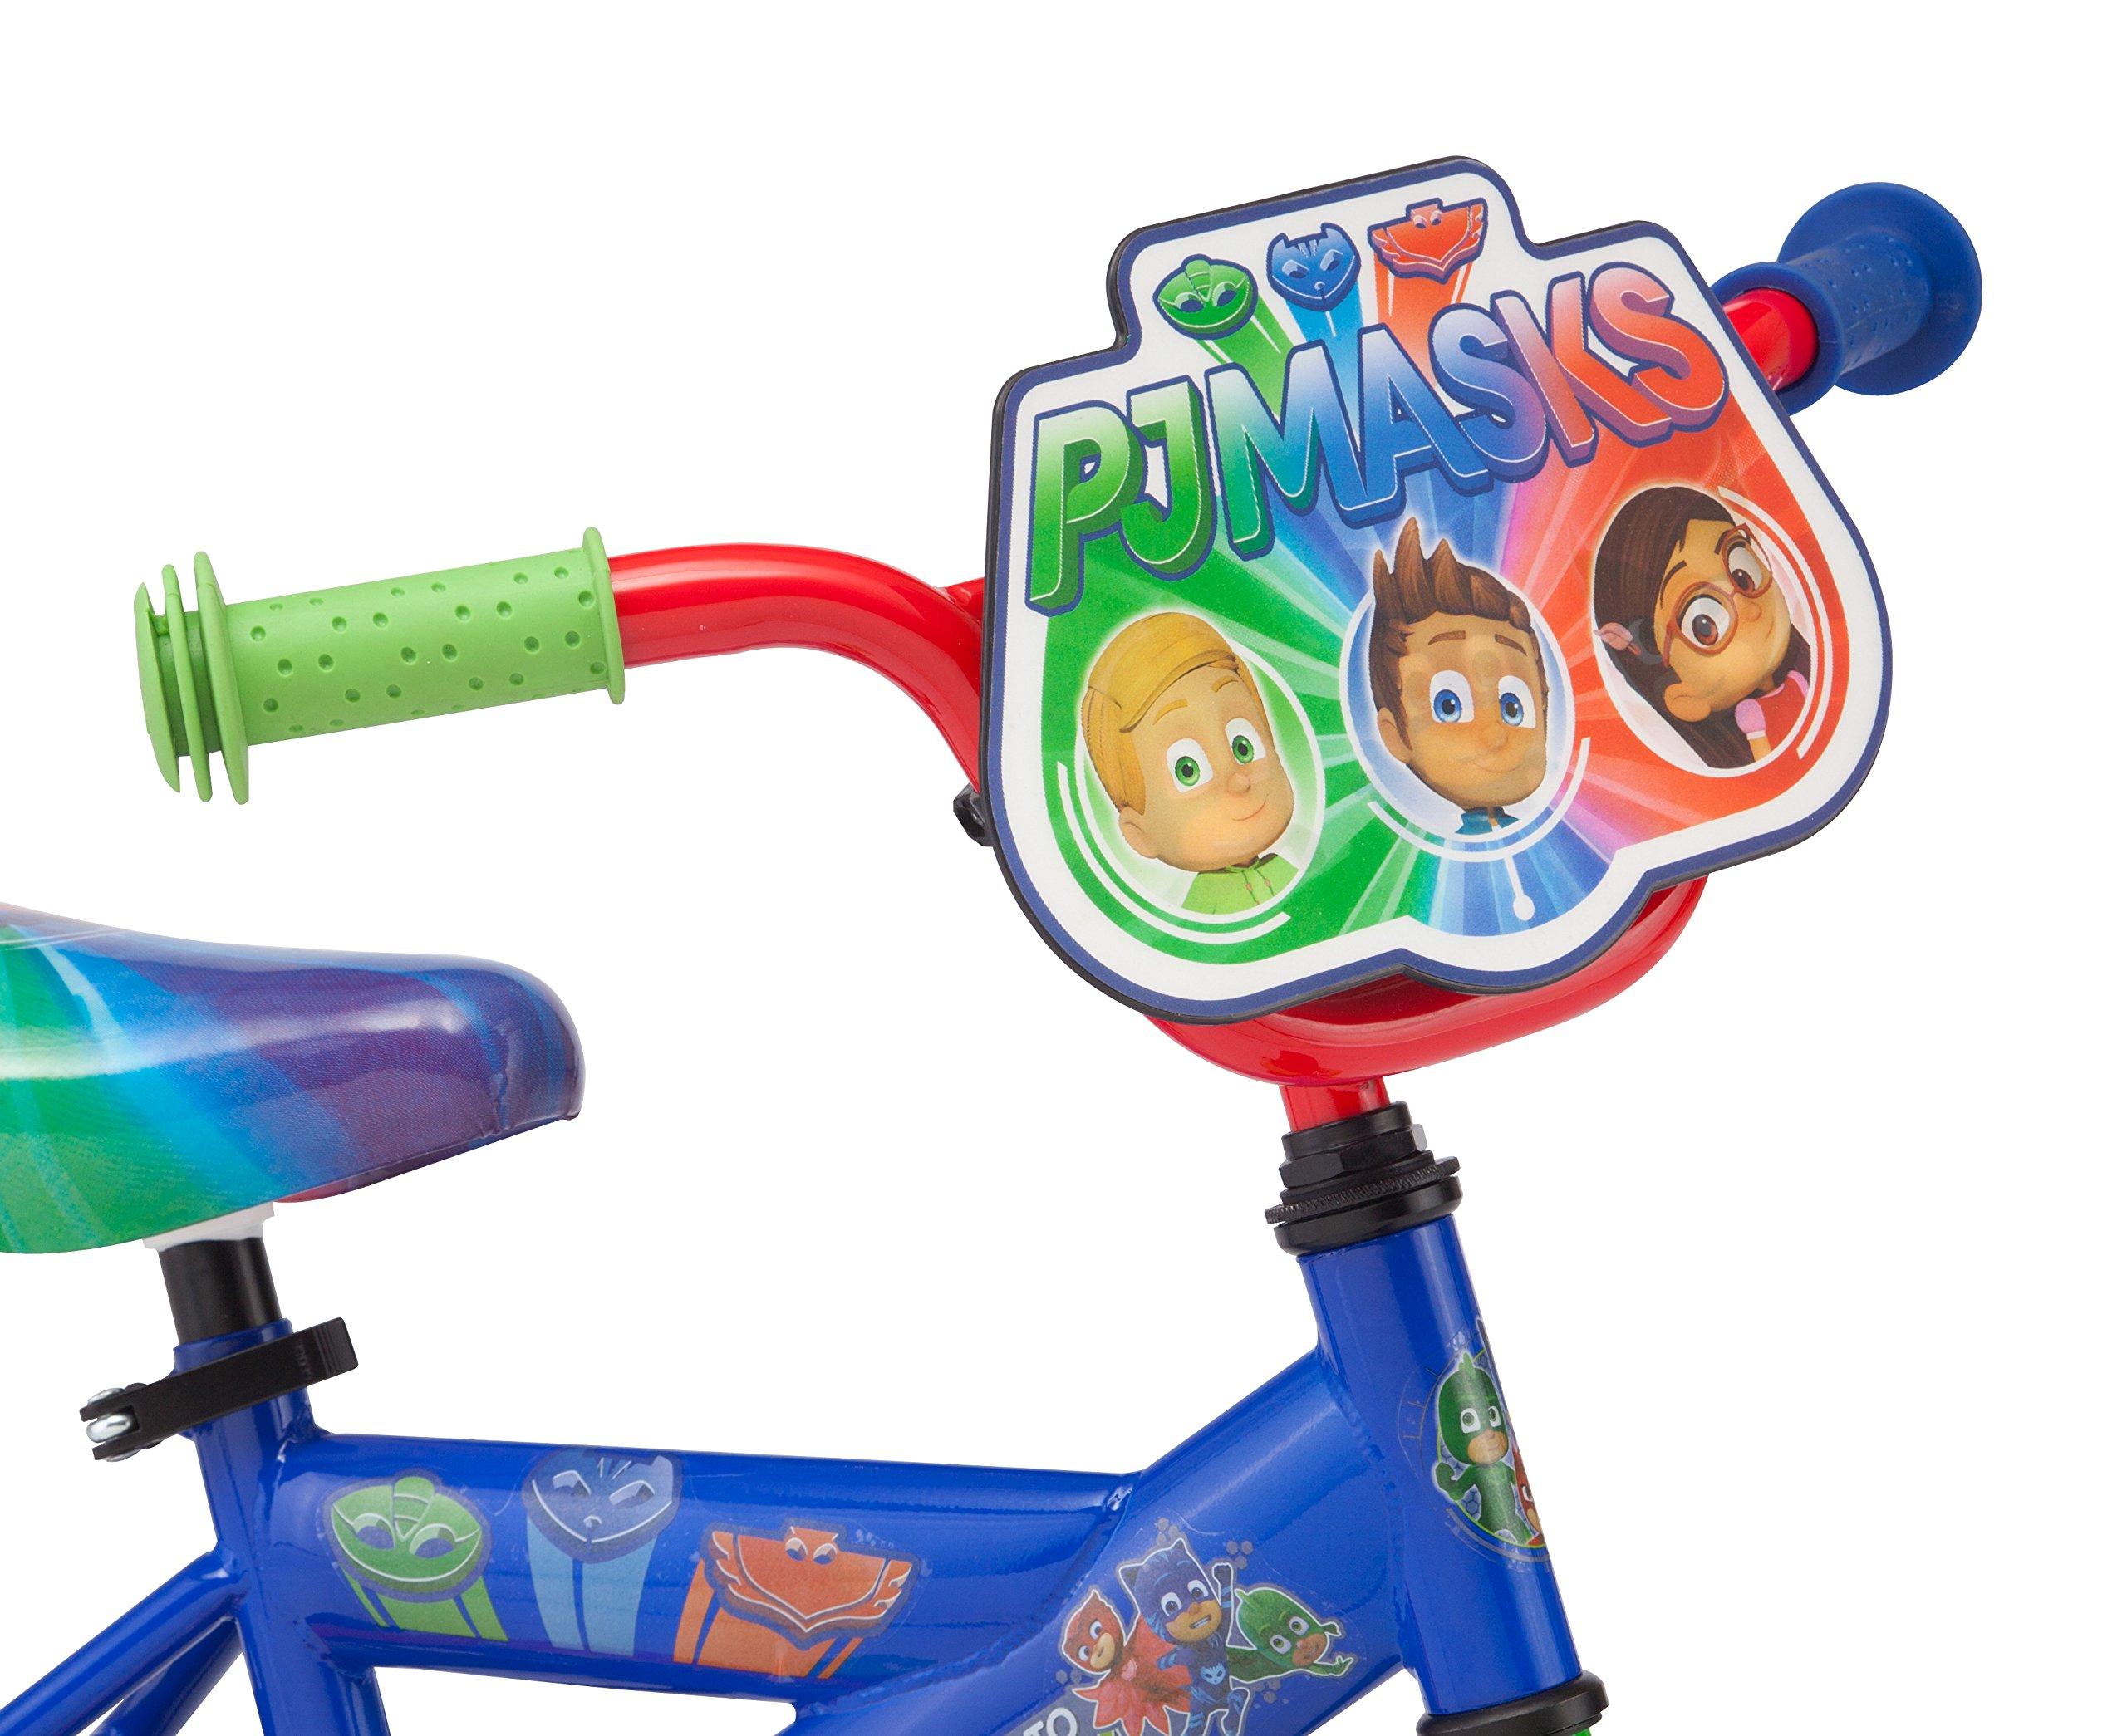 "PJ Masks Boy's 12"" Bicycle, Blue by PJMASKS (Image #2)"